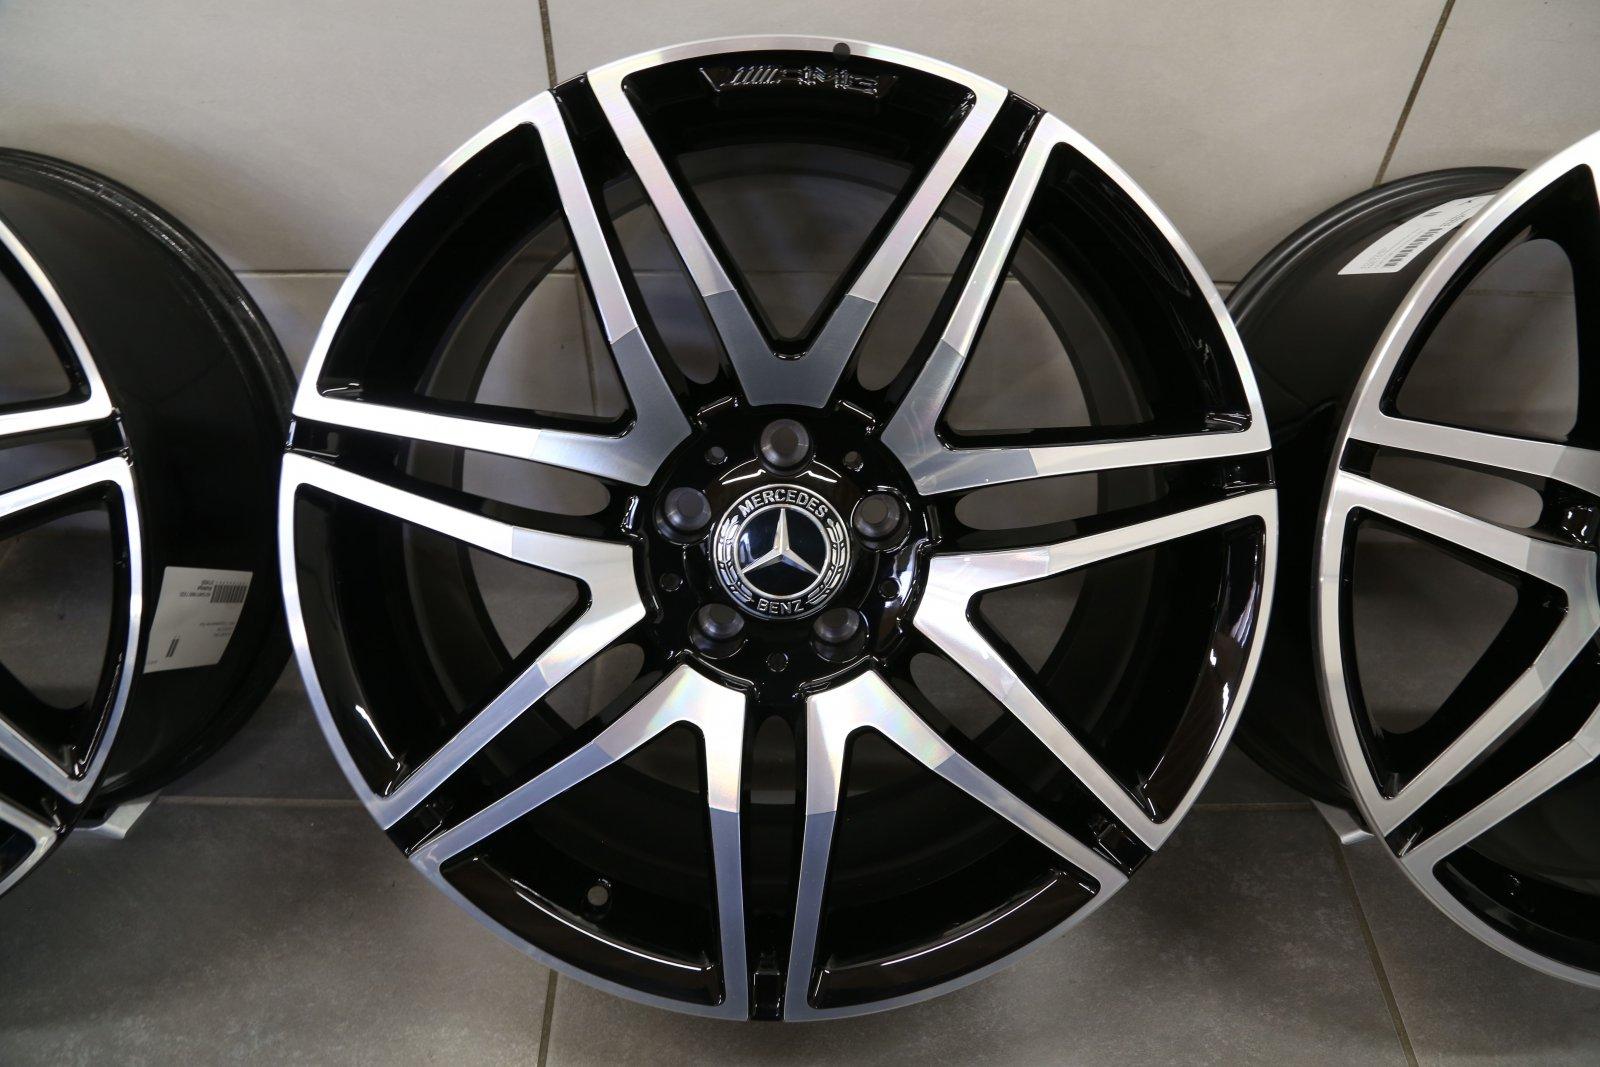 Mercedes Benz E-Class W212 S212 Original 19 Inch AMG Alloy Wheels A2124014502   eBay